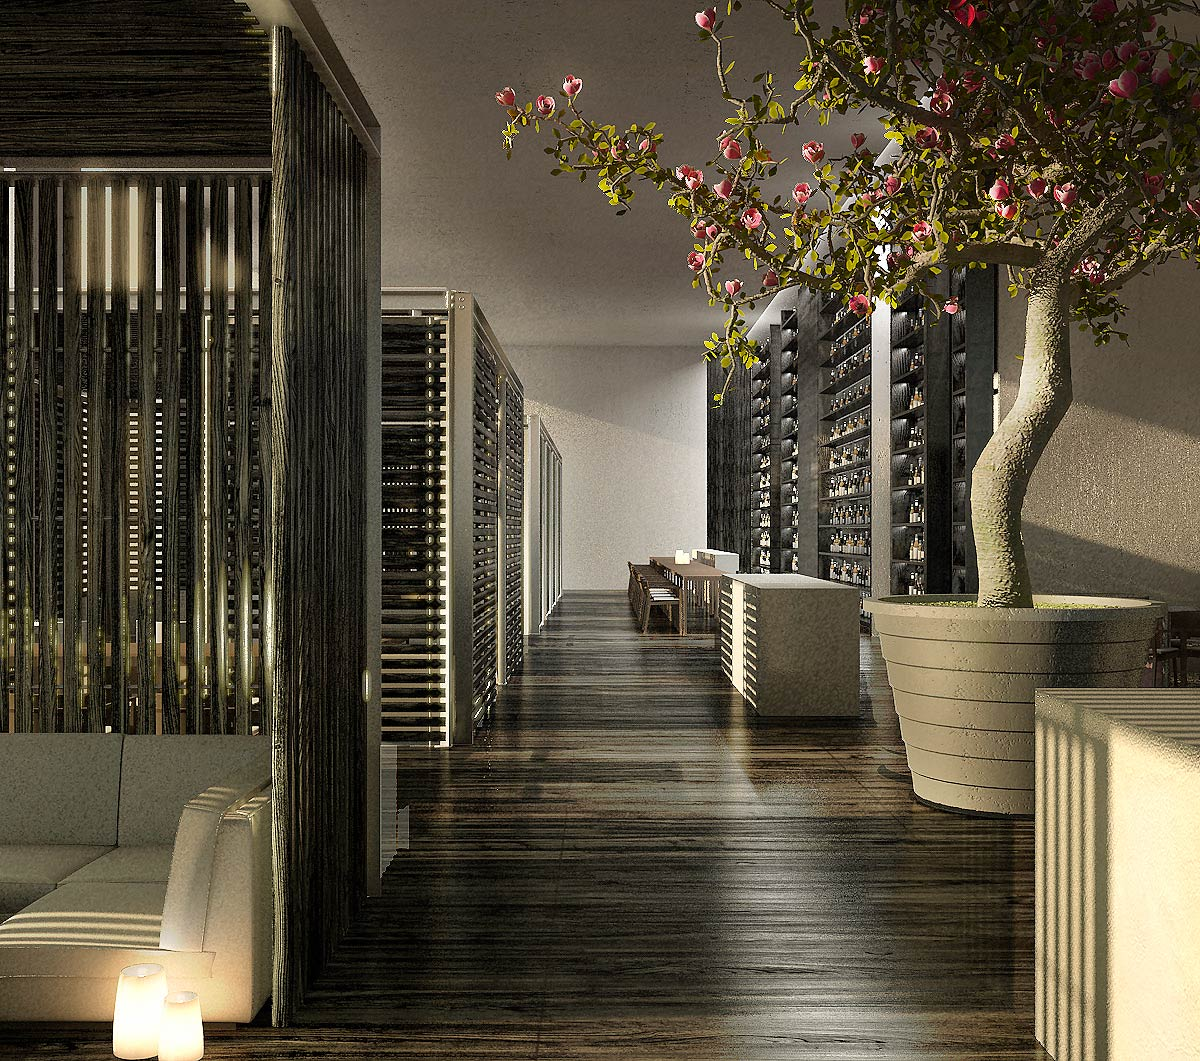 Restaurant in Hotel Rio Janeiro